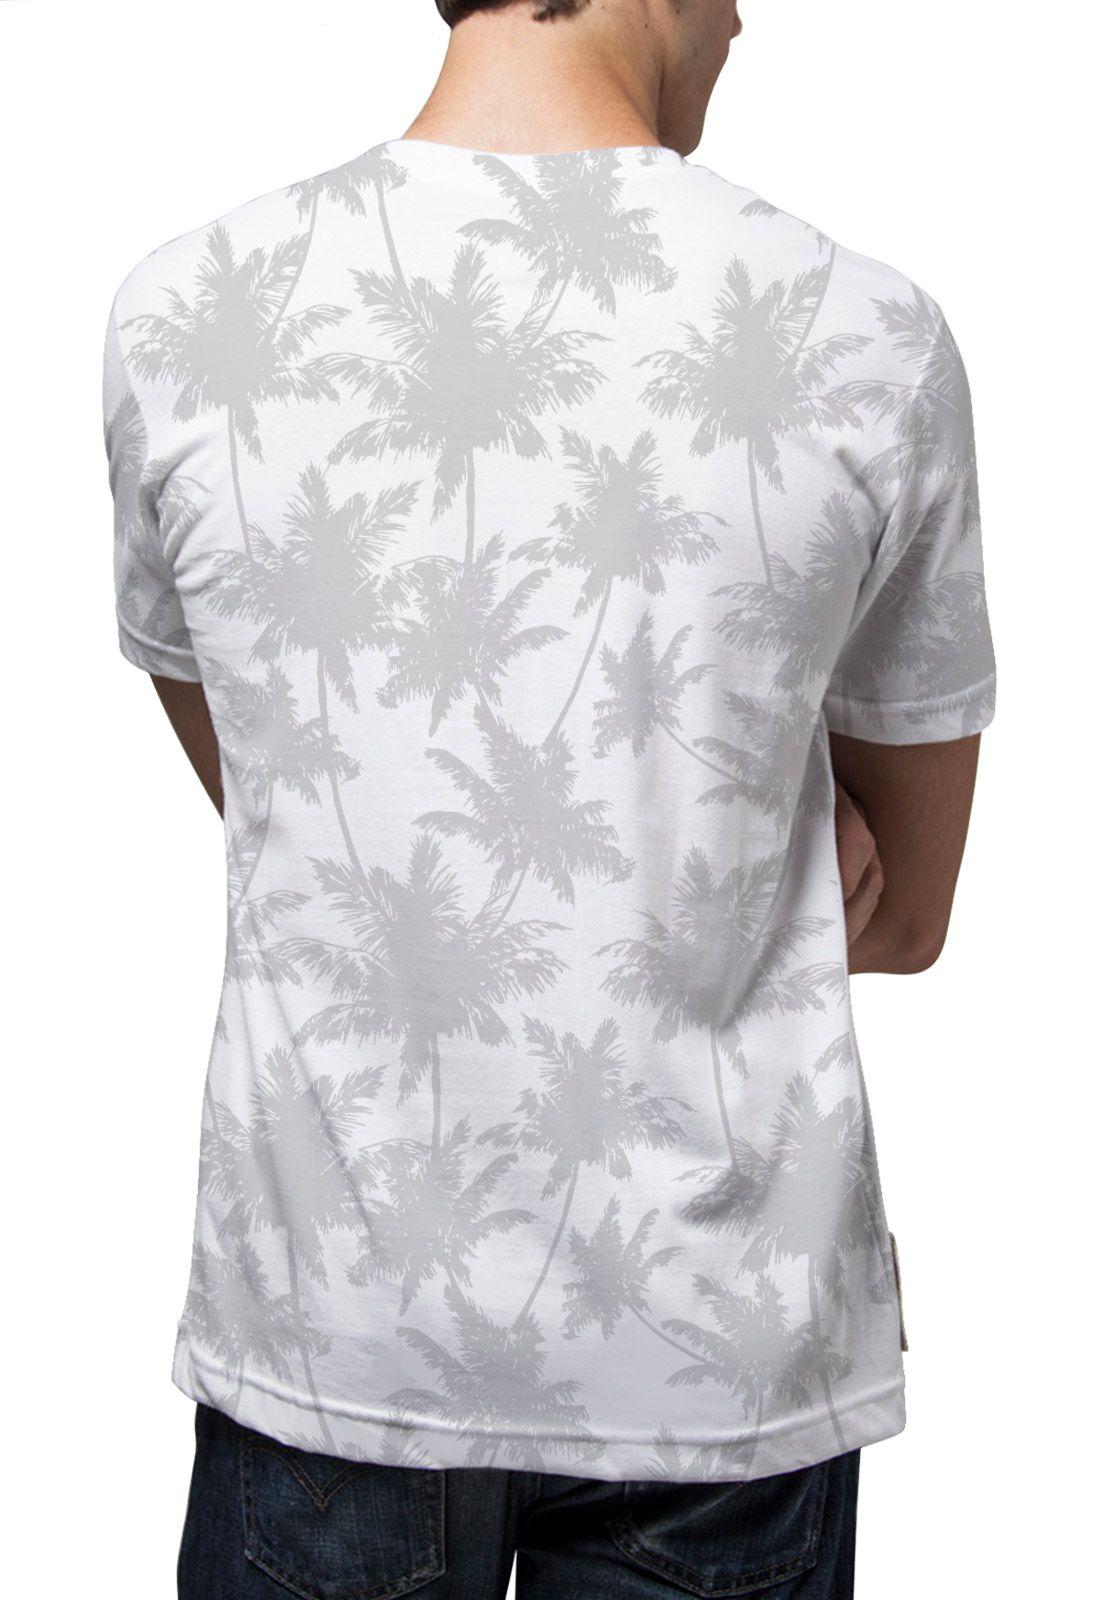 Camiseta Amazônia Corrido Coqueiros - Branco